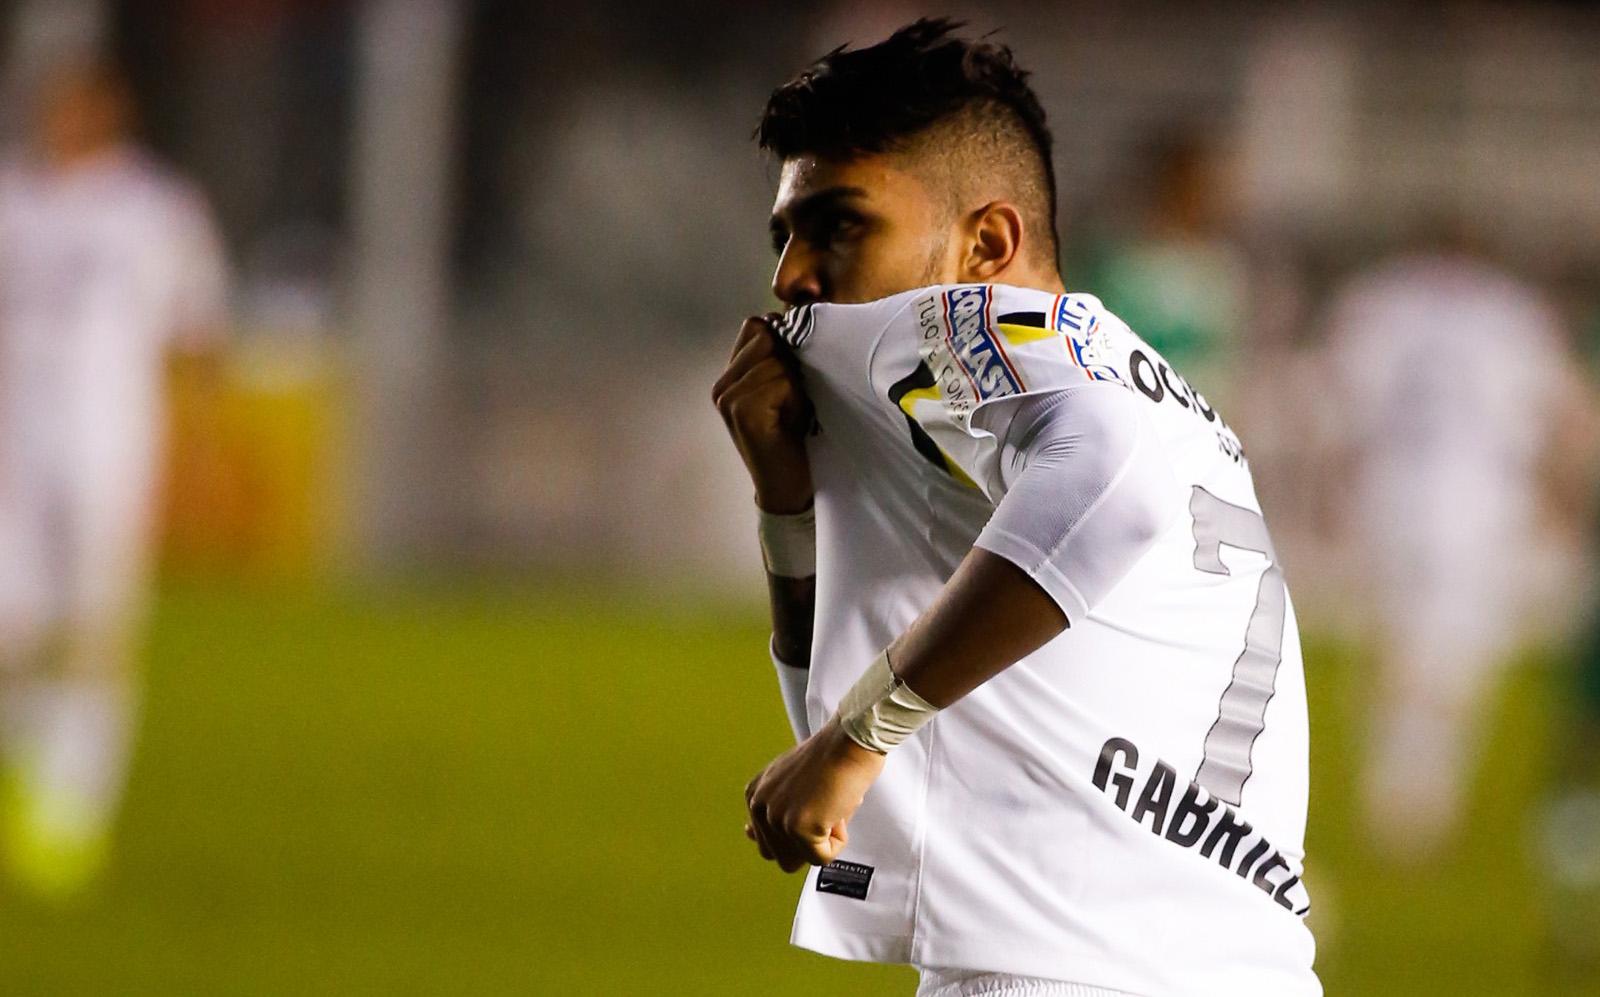 Juventus, prima offerta ufficiale per Gabigol: 20 milioni per il nuovo Neymar